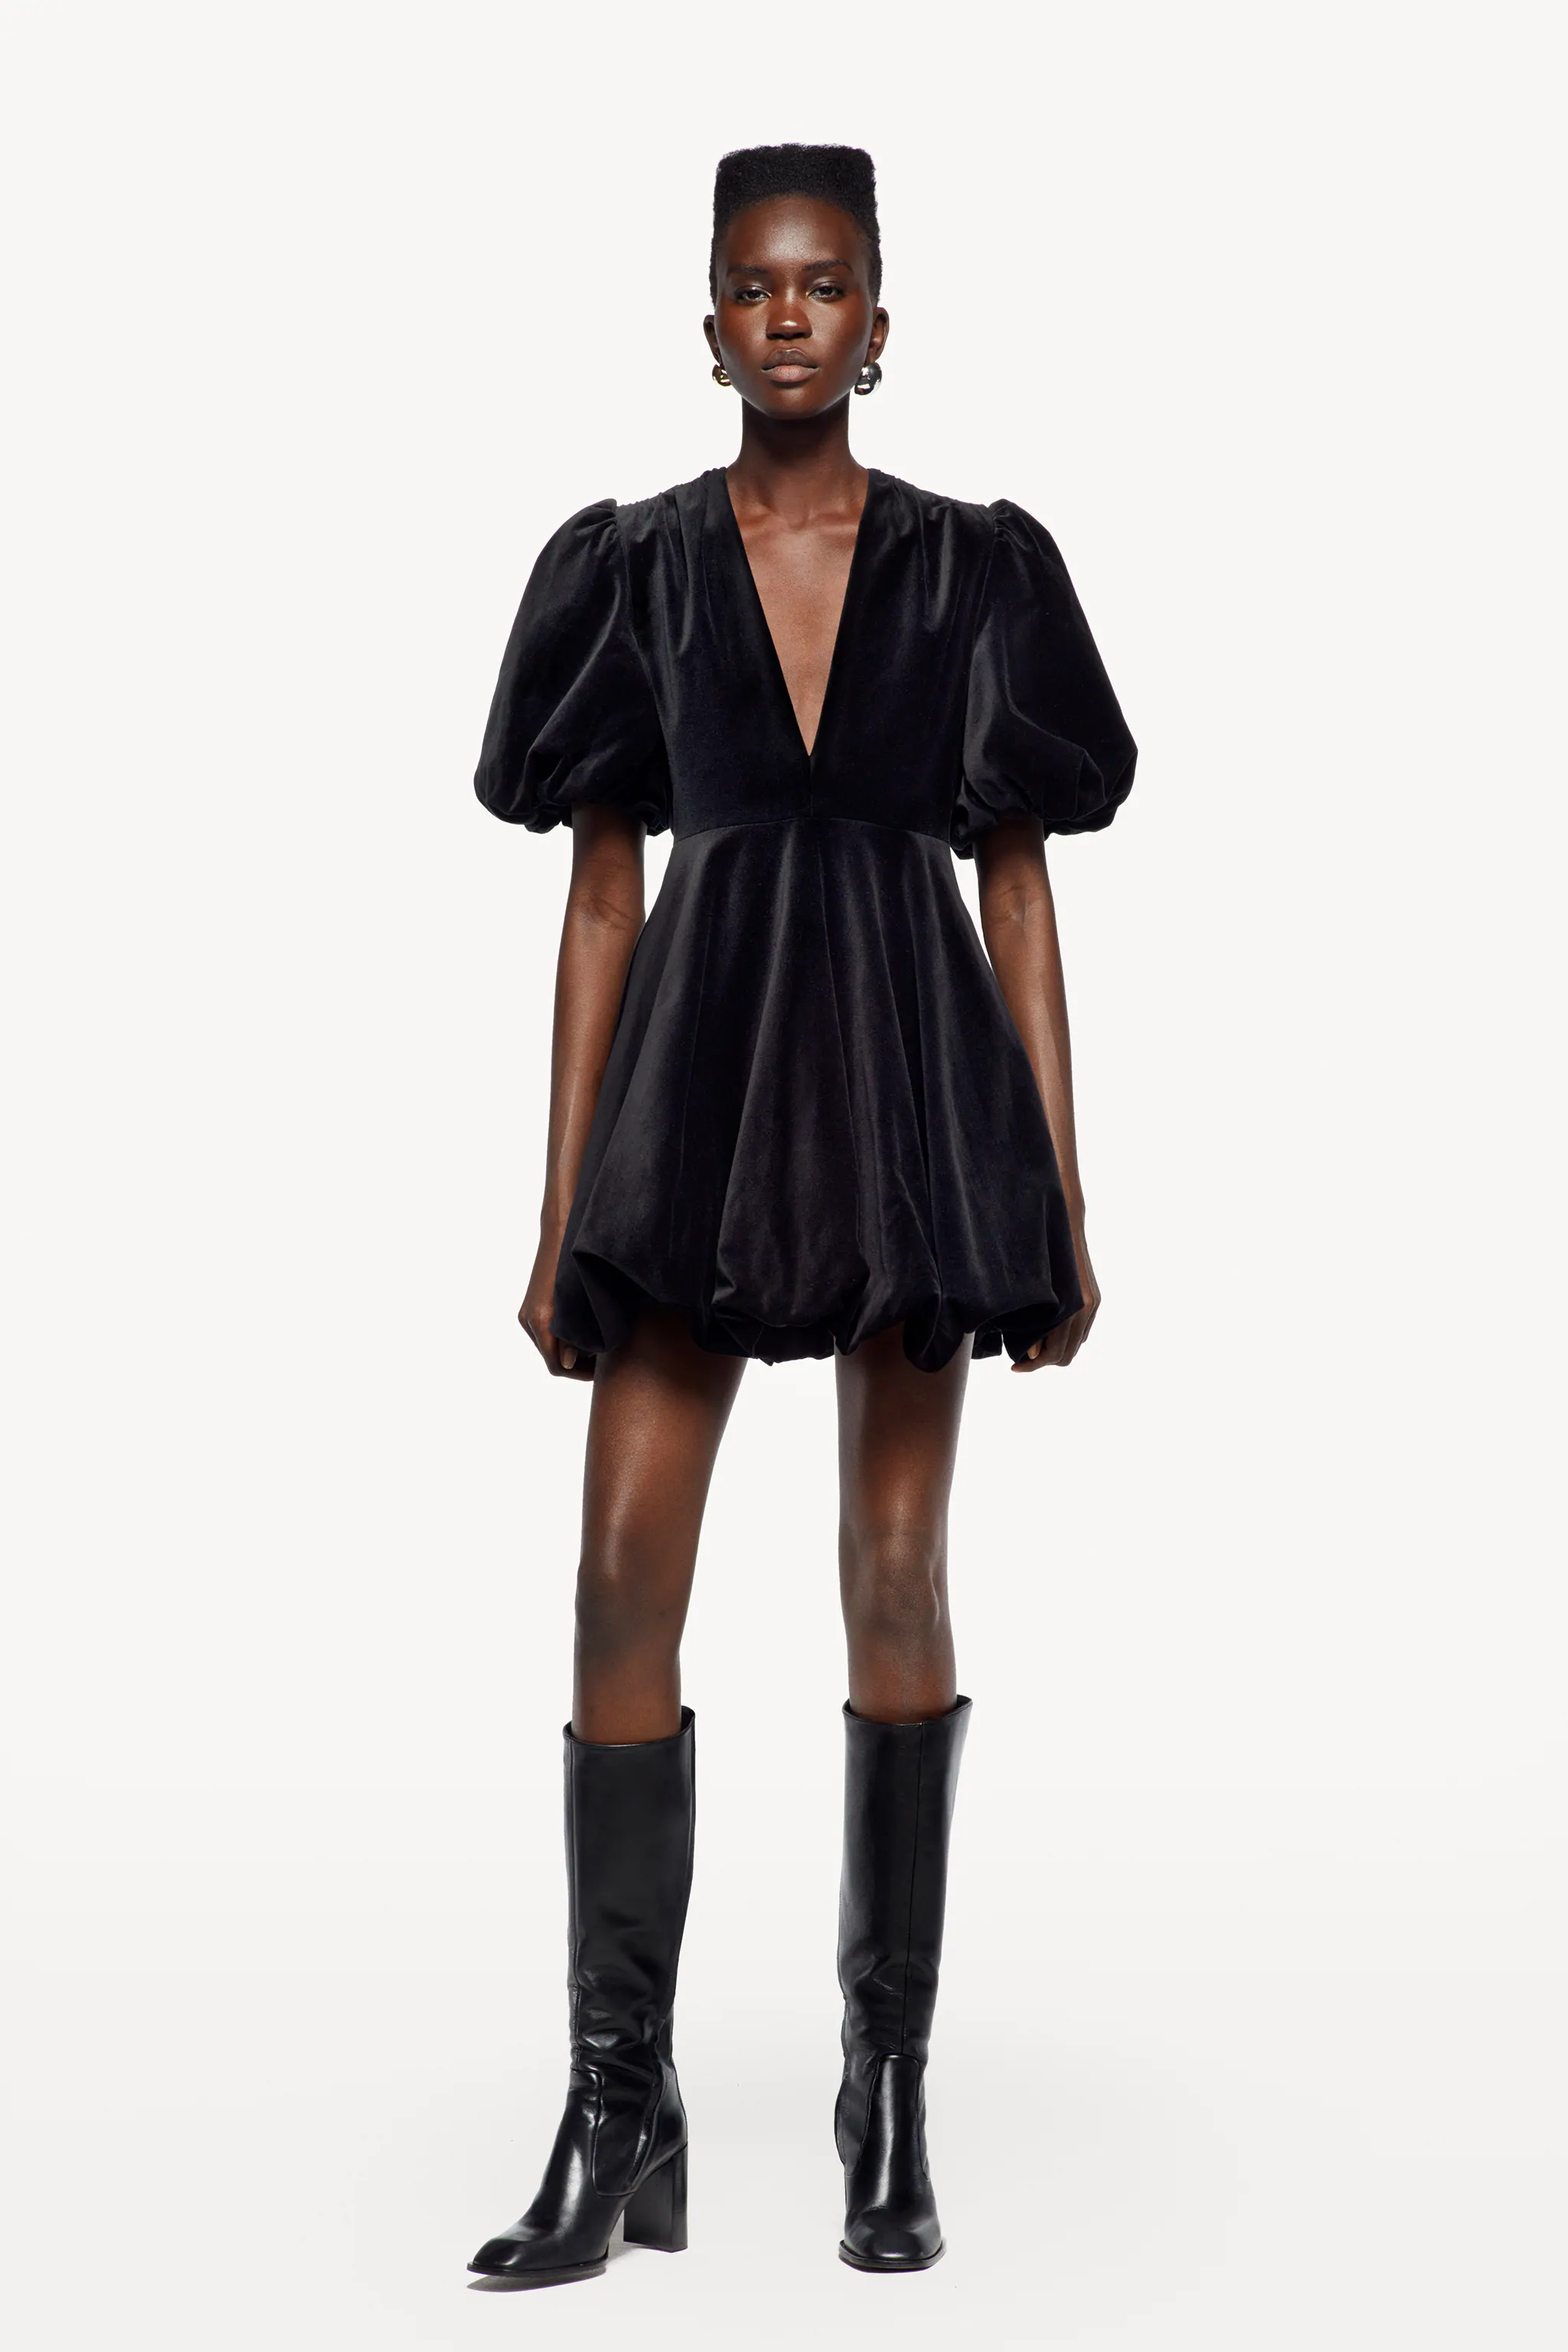 Stylecaster Zara Black Friday Zara Outfit 2020 Zara Outfit Zara Fashion Zara Outfit 2020 Winter Zara Outfit 2020